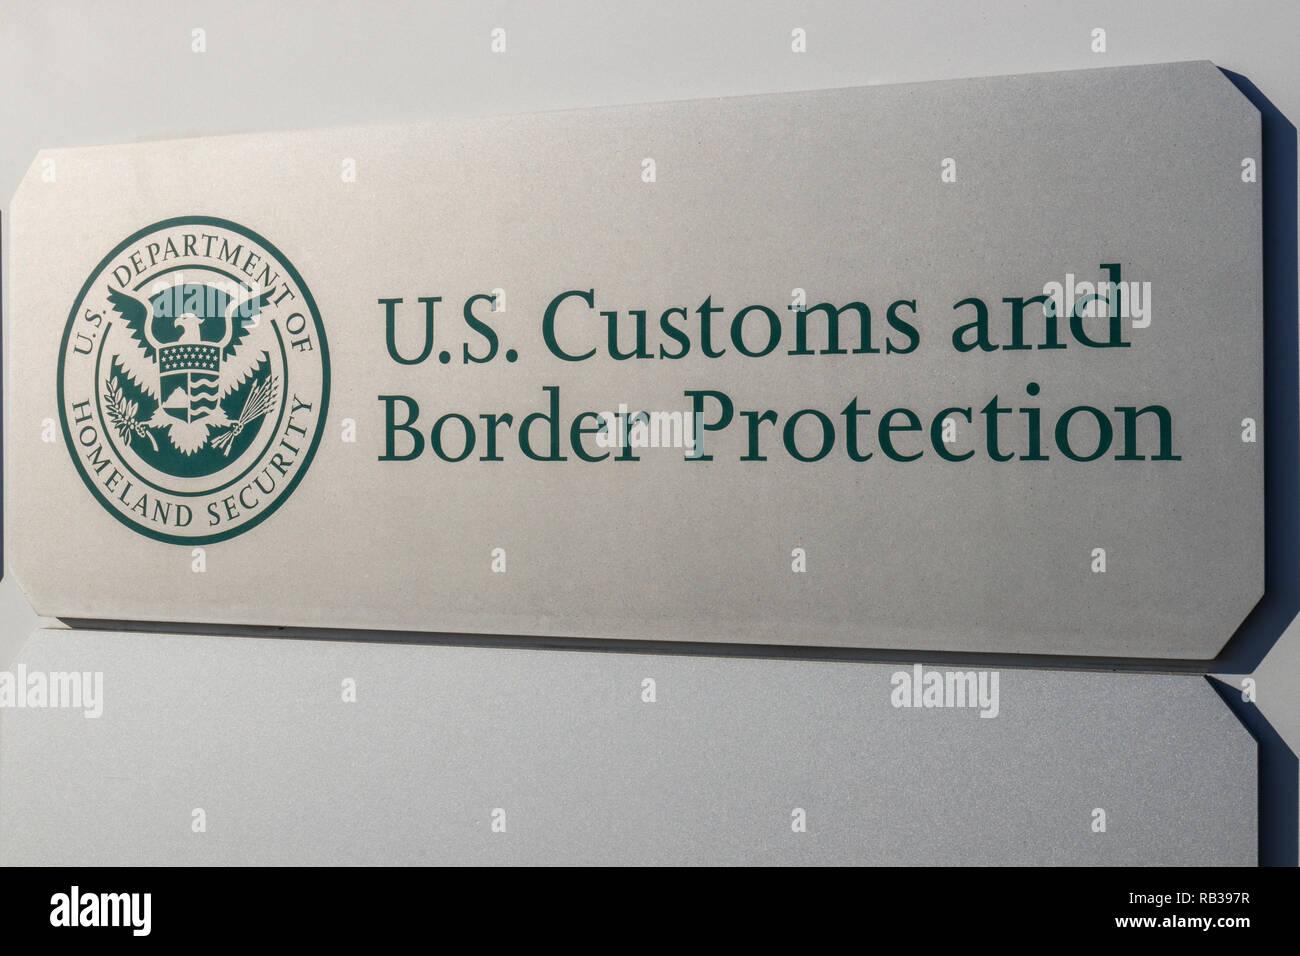 Indianapolis - Circa January 2019: Customs and Border